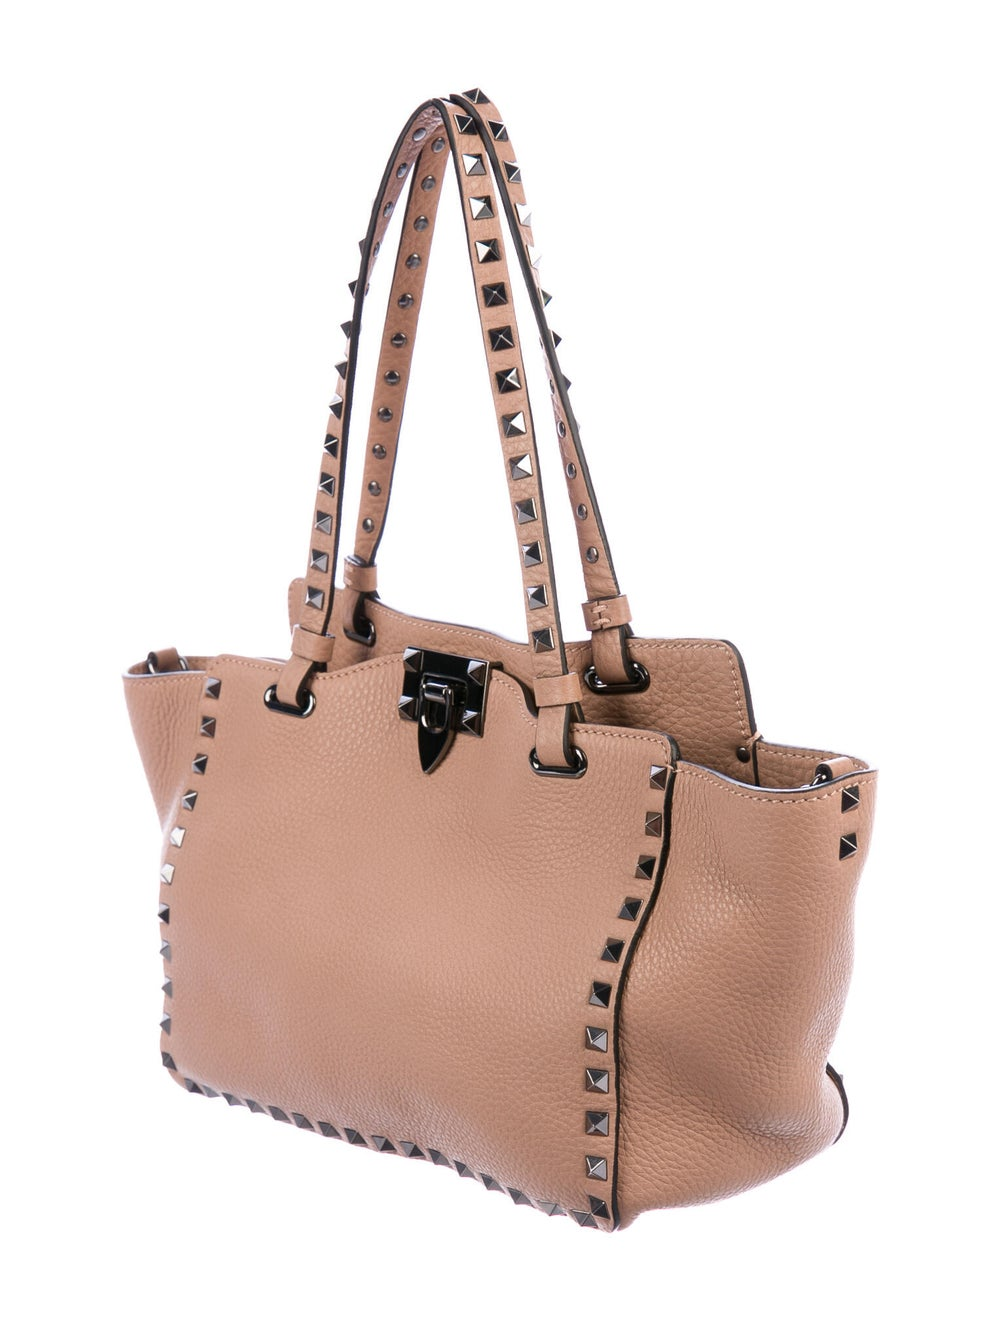 Valentino Leather Rockstud Tote Pink - image 3